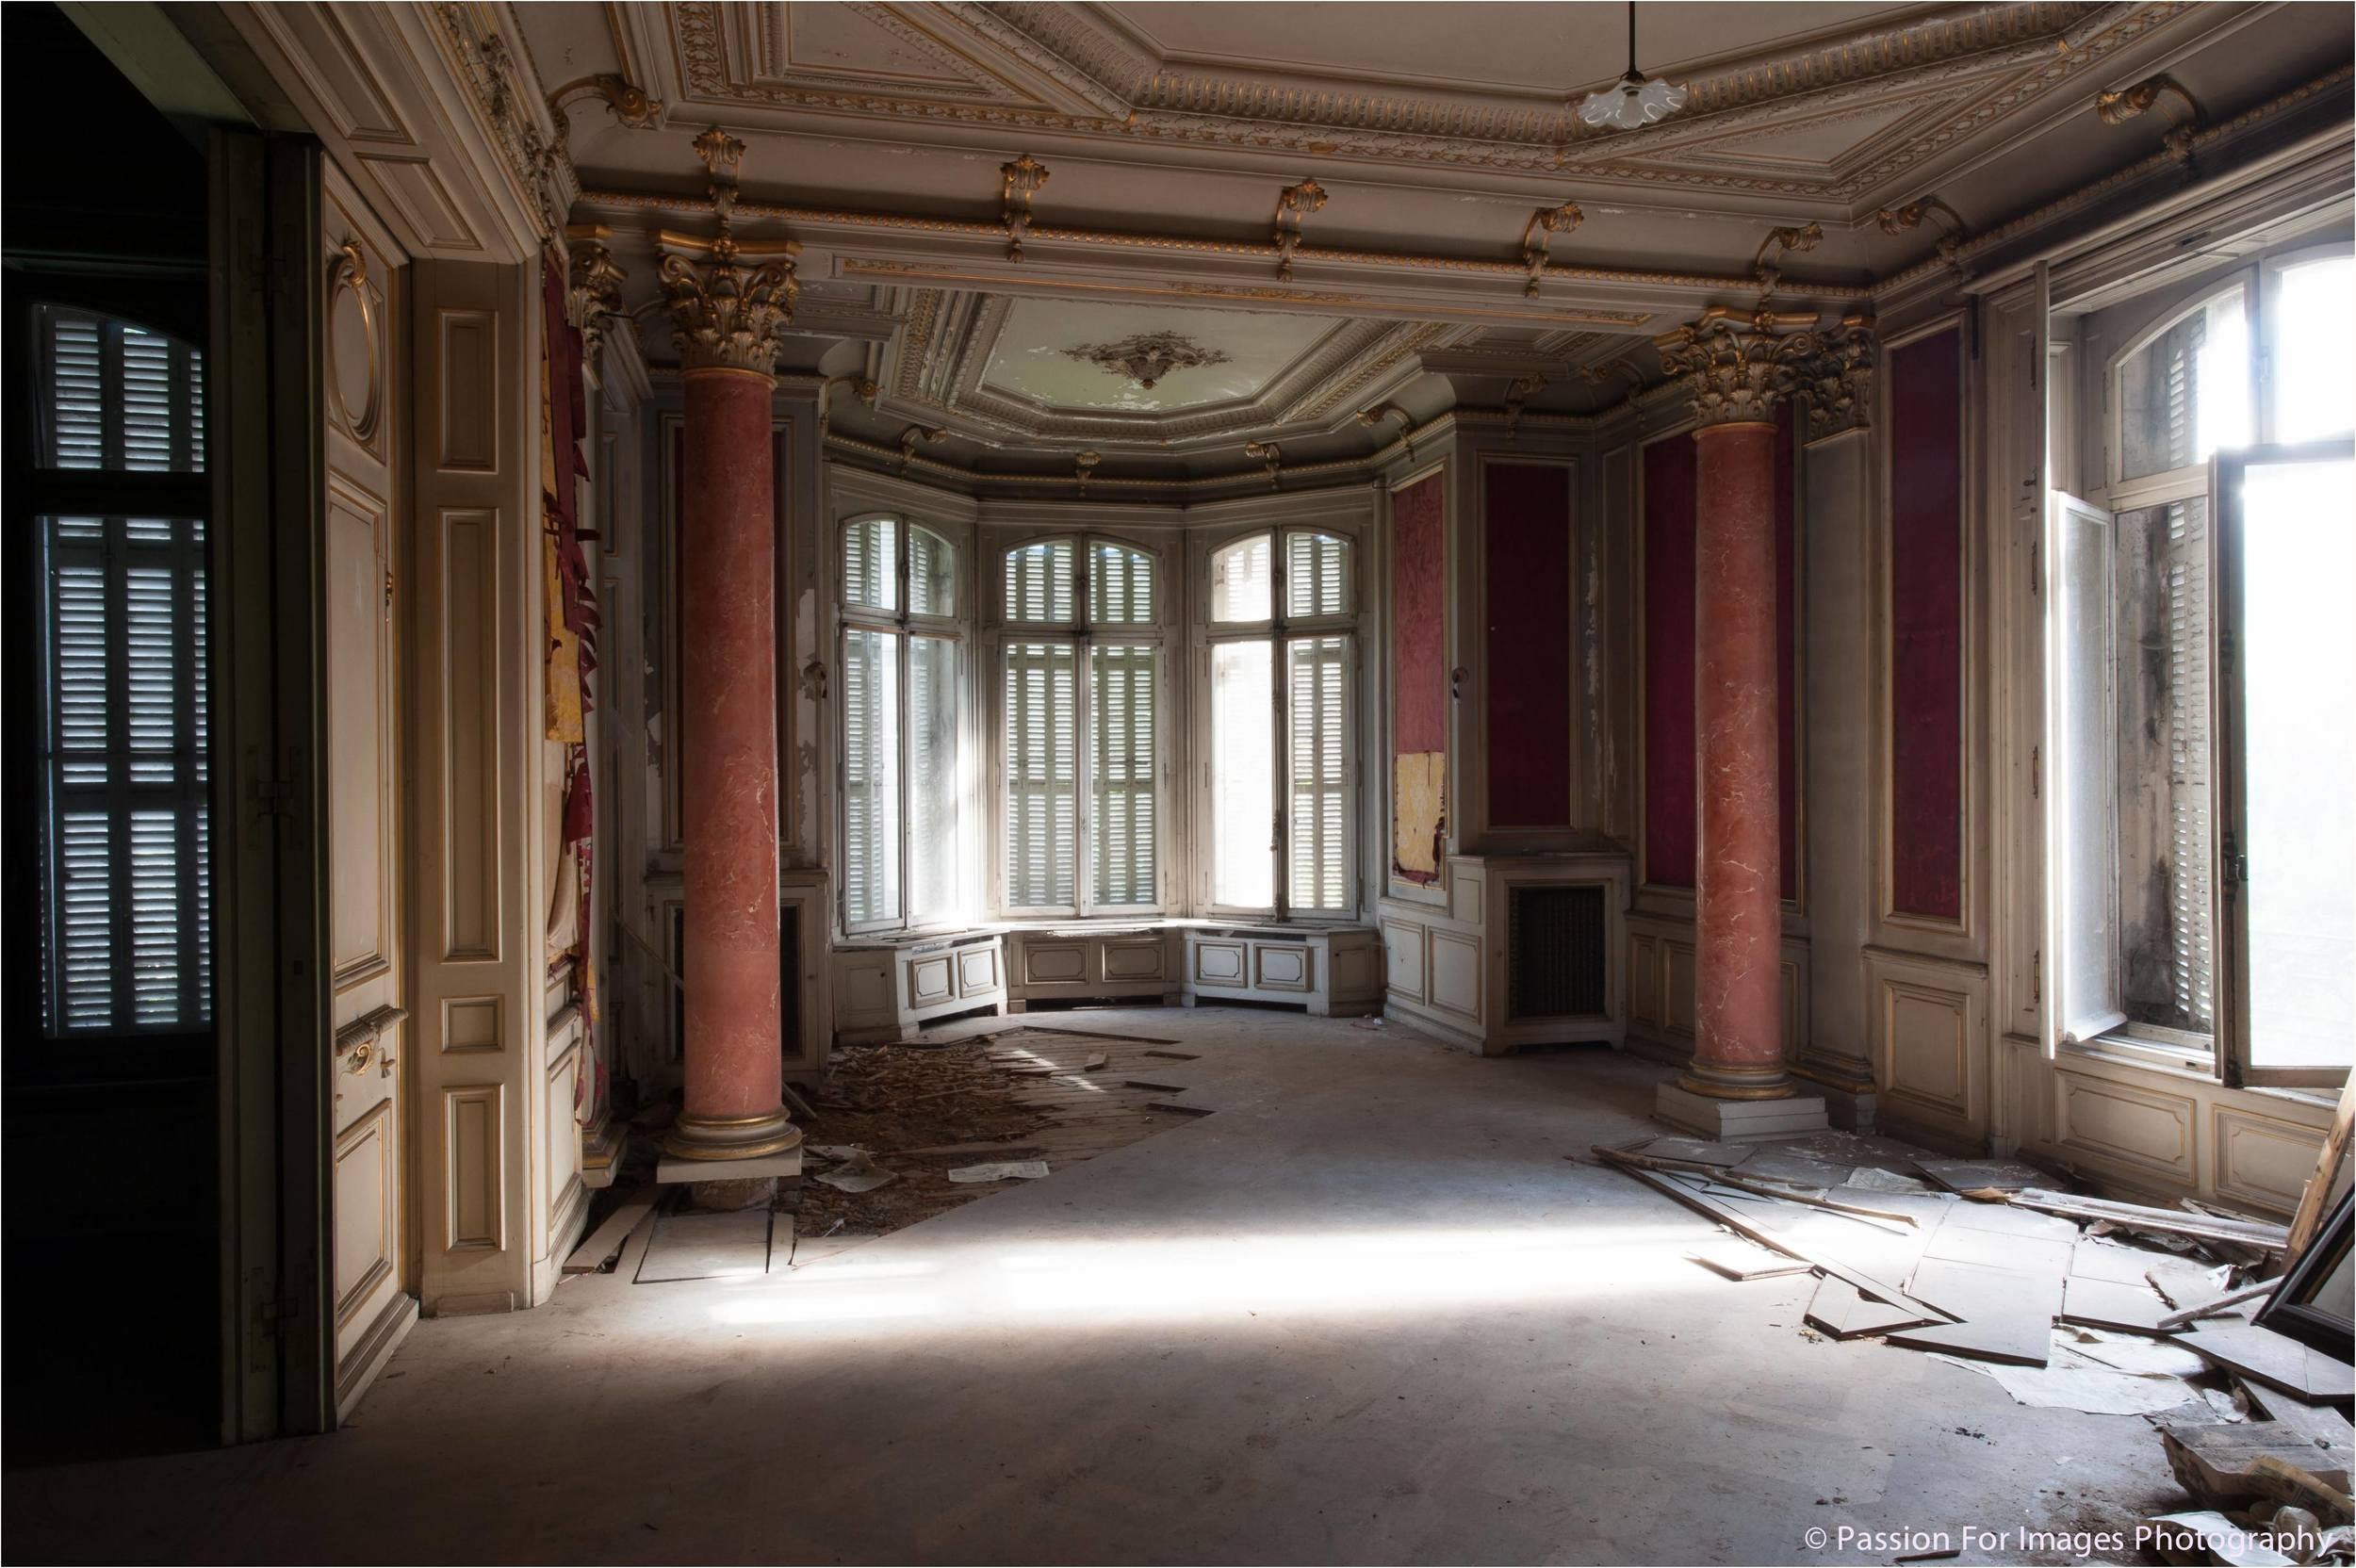 PFI__D7C0672_2014_08_Chateau_Lumiere.jpg